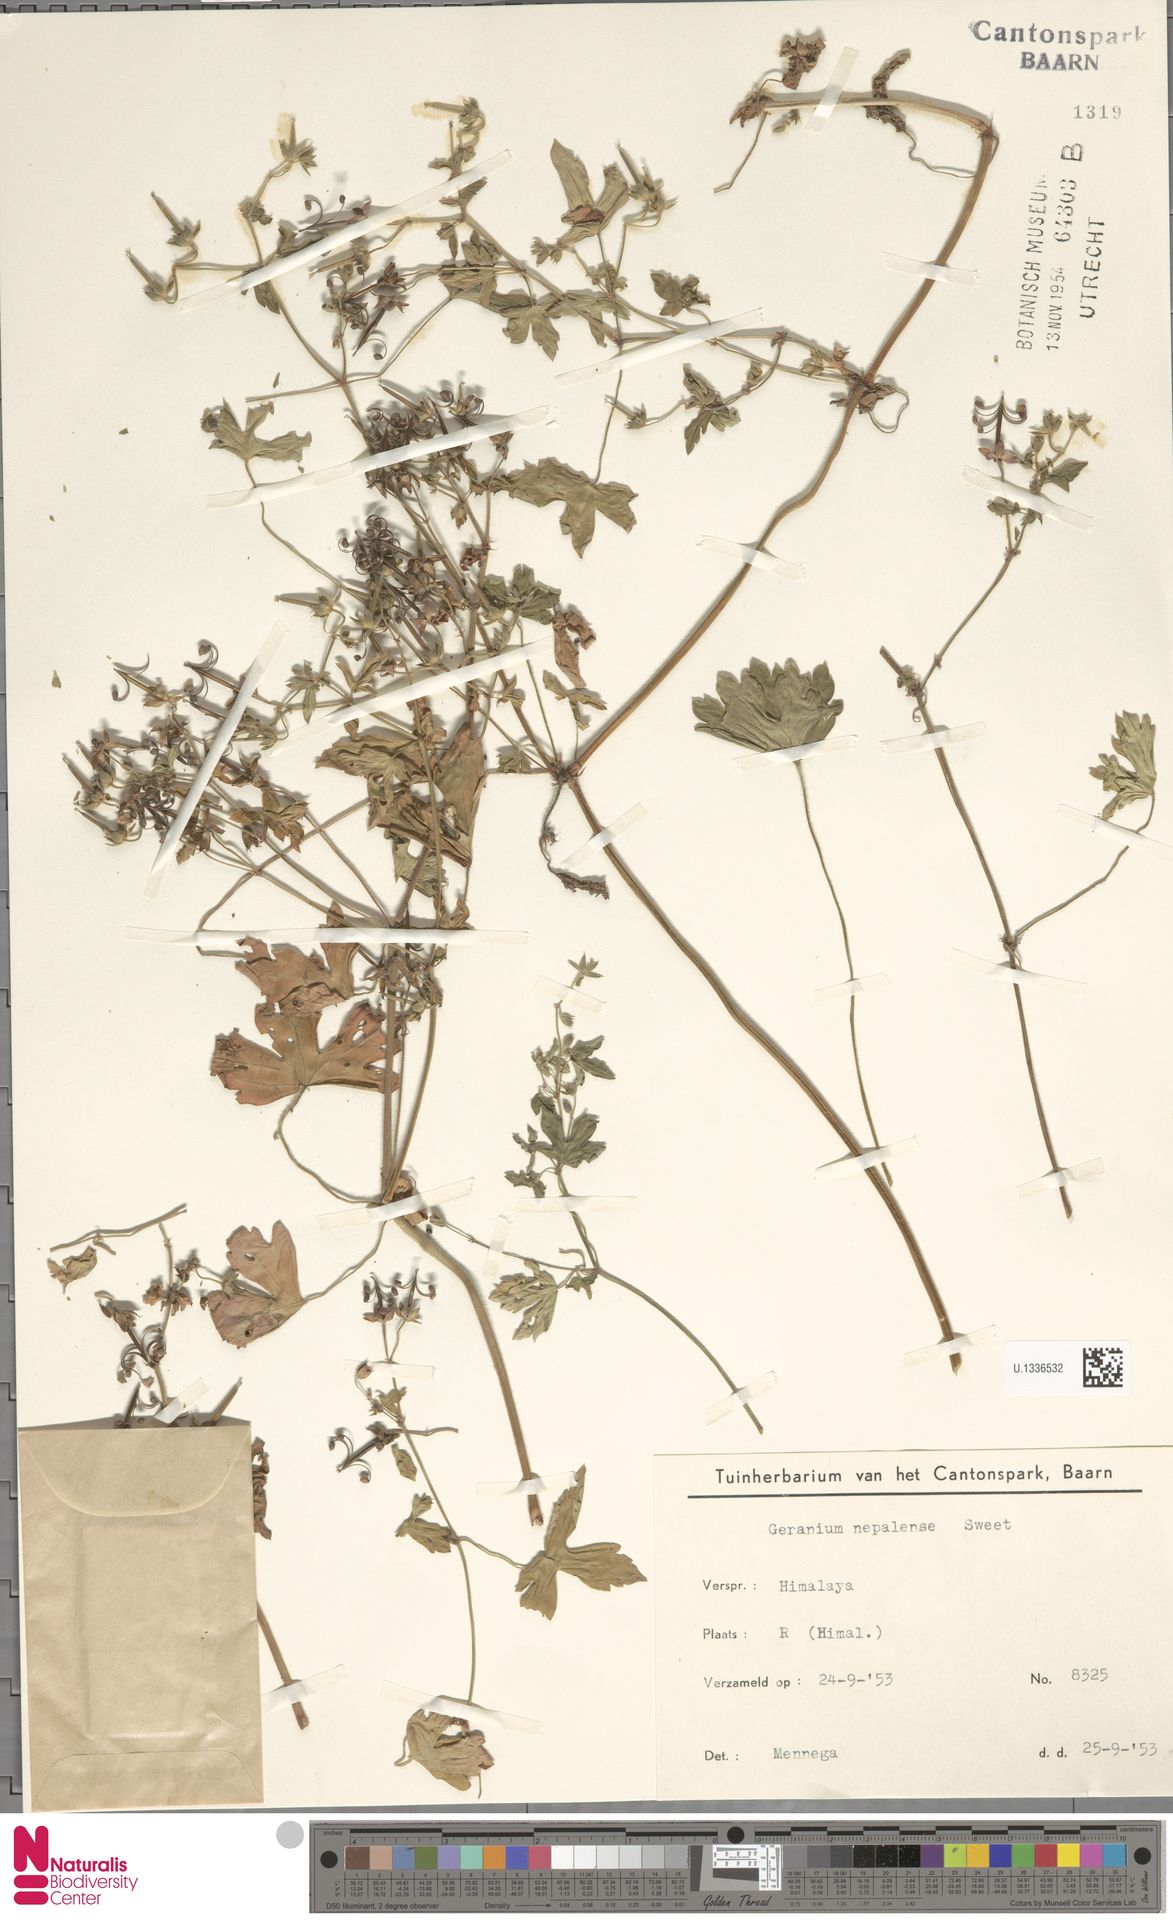 U.1336532 | Geranium nepalense Sweet